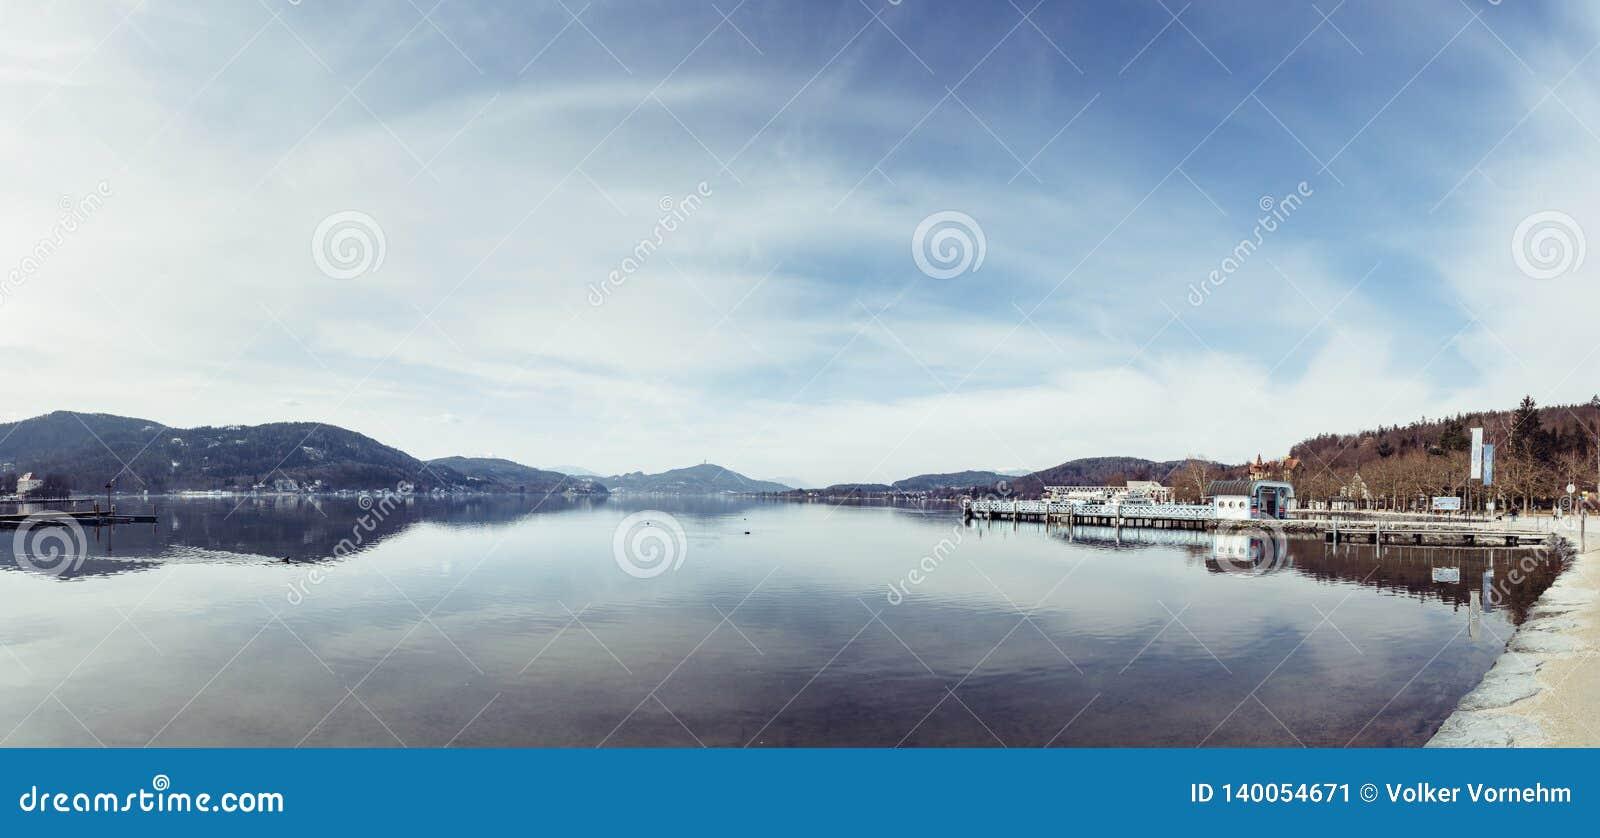 Friedelstrand, costa sul Wörthersee, Klagenfurt, Carinthia, Áustria - 20 de fevereiro de 2019: Vista sobre o Wörthersee para